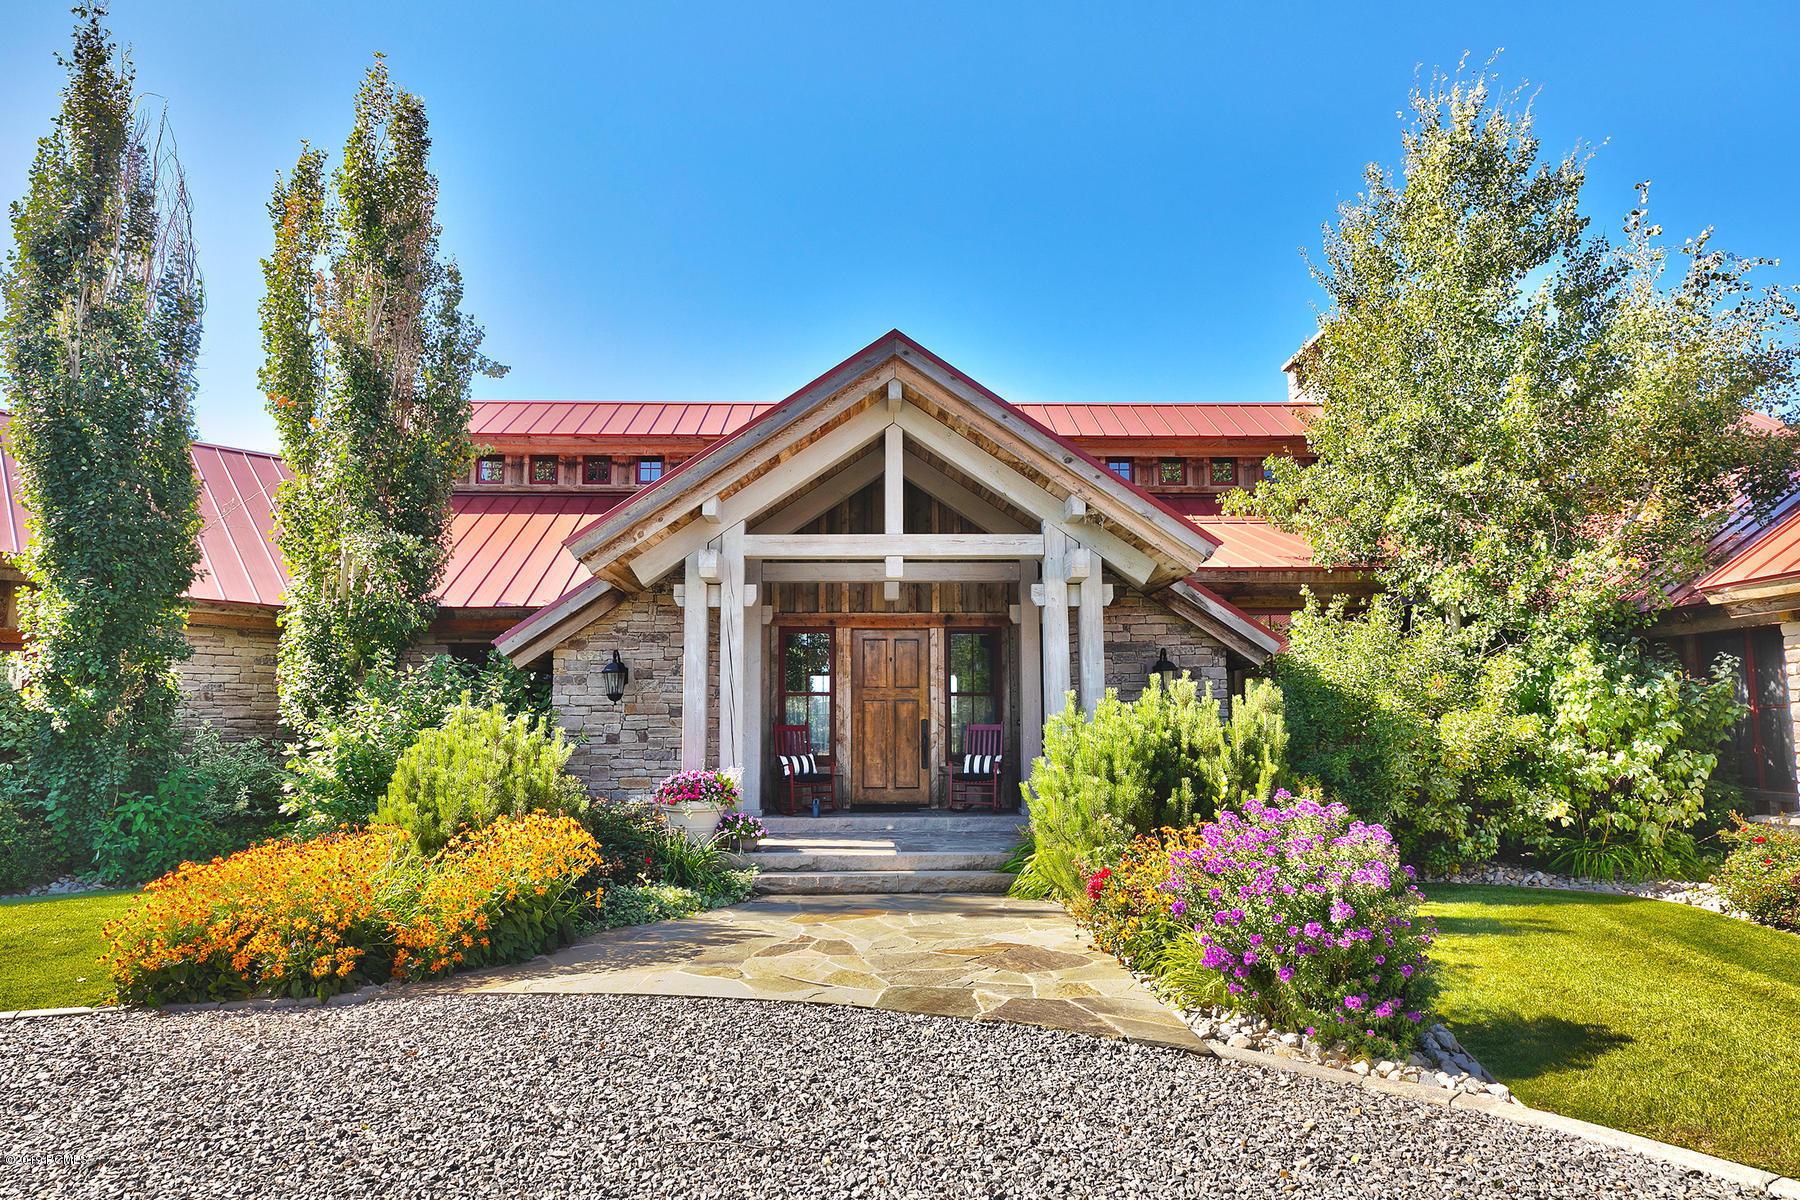 2805 Winterton Road, Heber City, Utah 84032, 4 Bedrooms Bedrooms, ,5 BathroomsBathrooms,Single Family,For Sale,Winterton,20190109112430415765000000